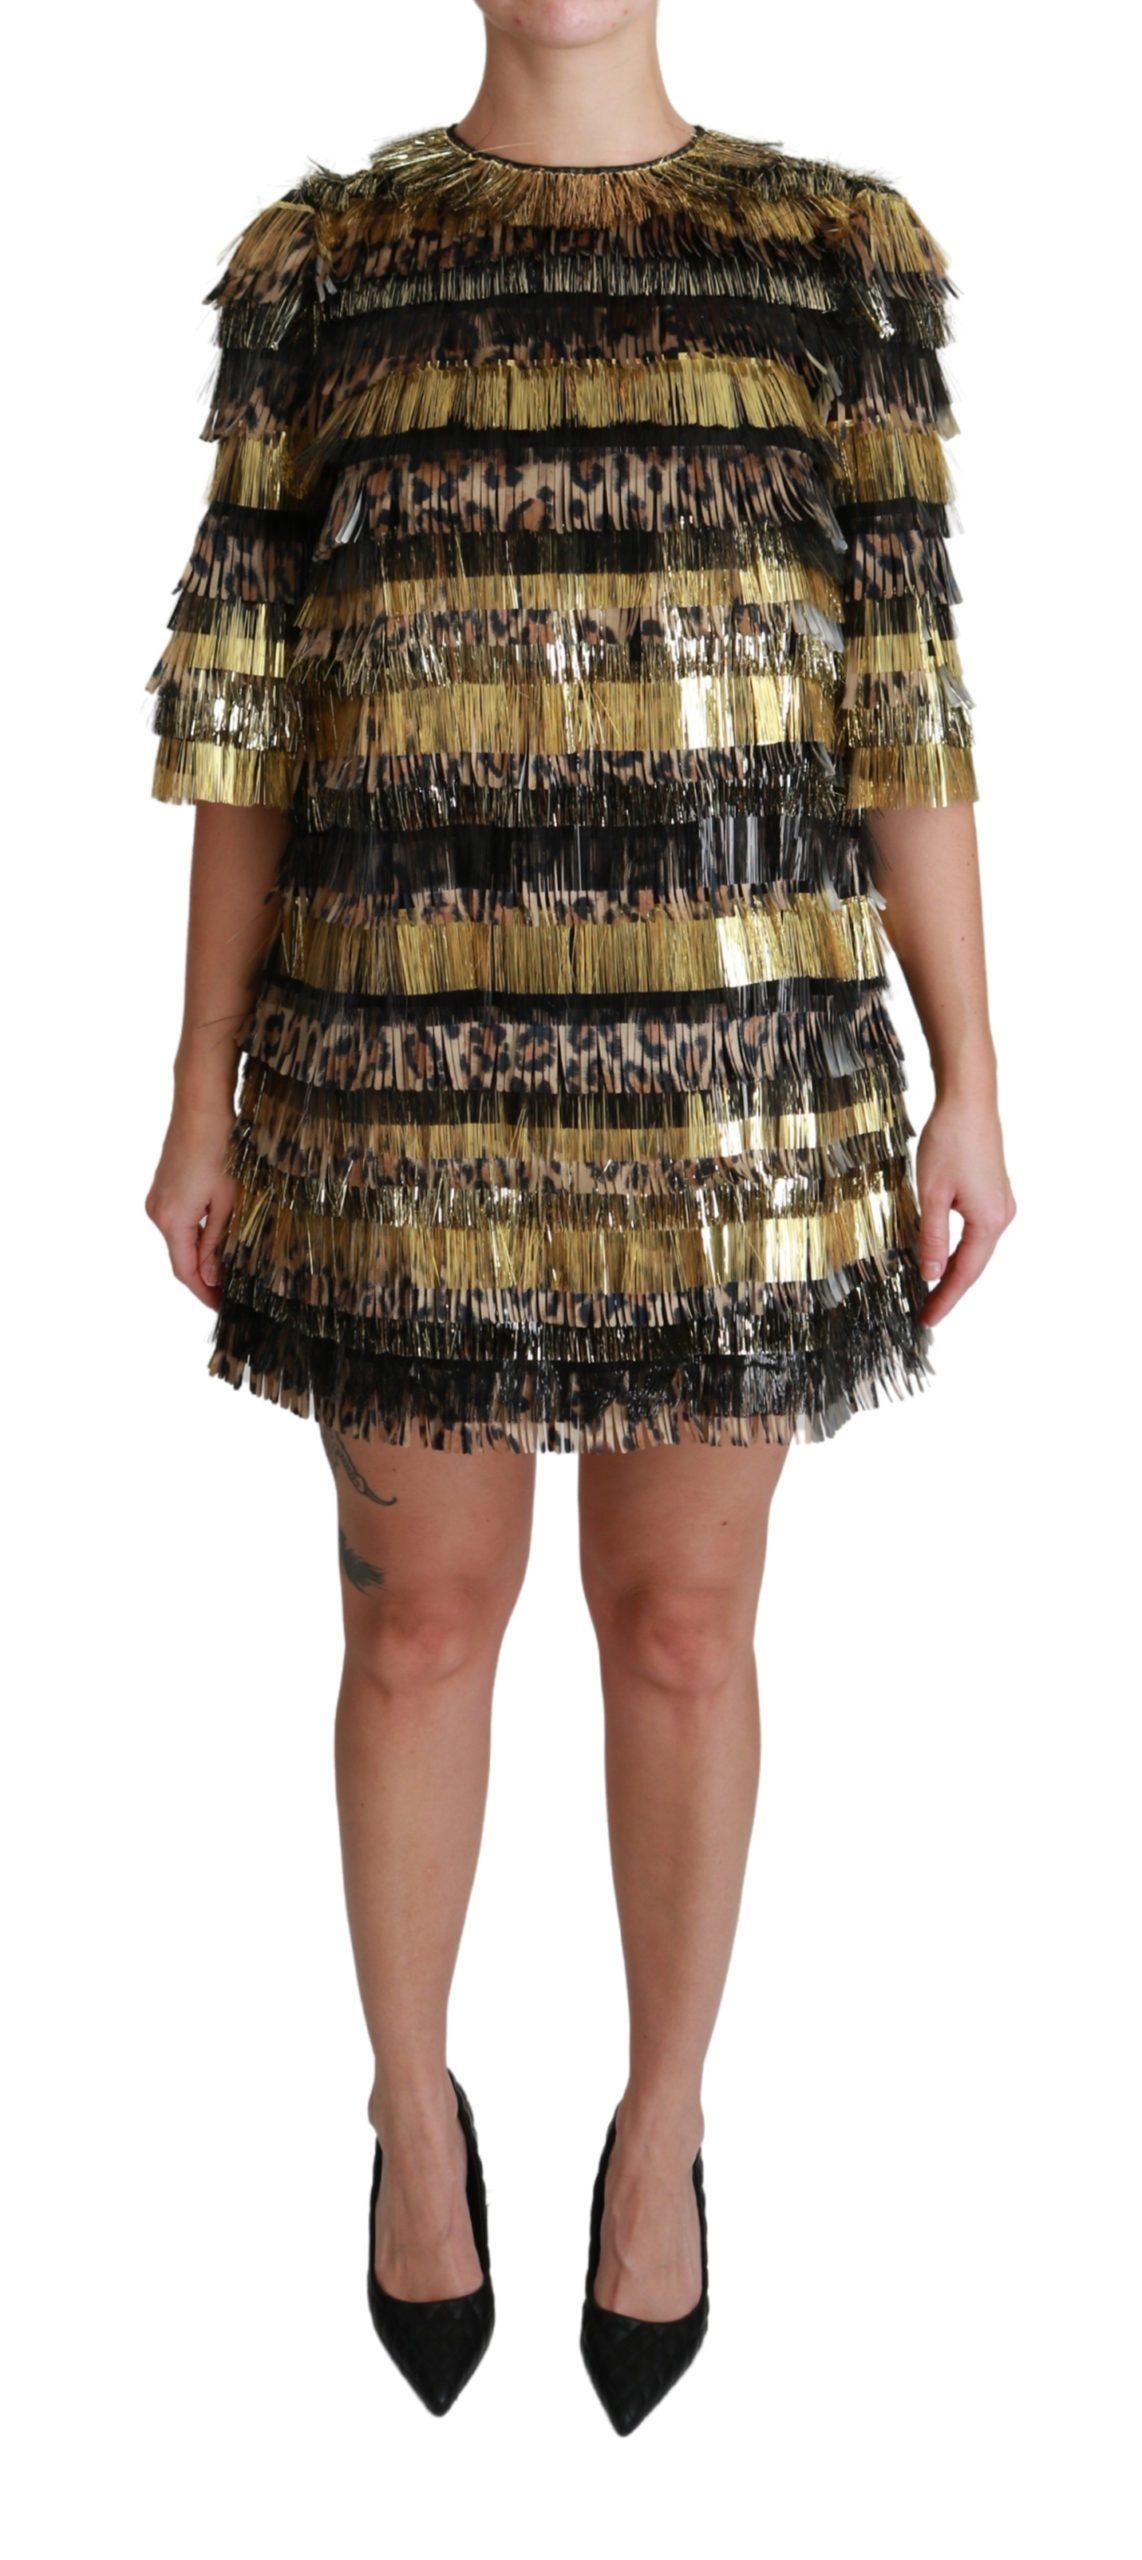 Dolce & Gabbana Women's Leopard Shift Mini Dress Black DR2508 - IT40|S